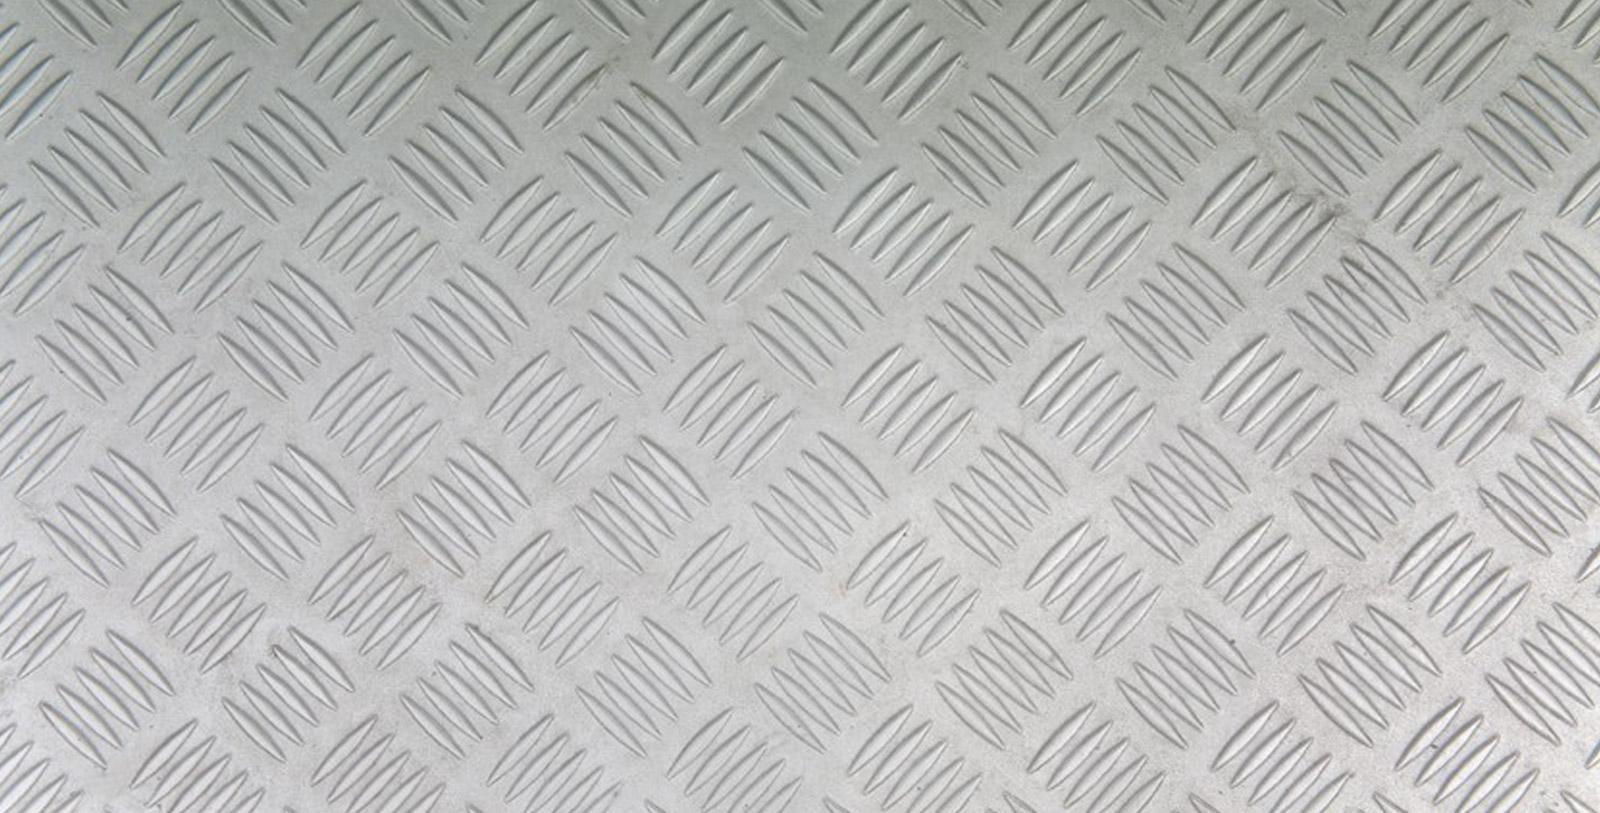 Gachman Scrap Metal Background Image